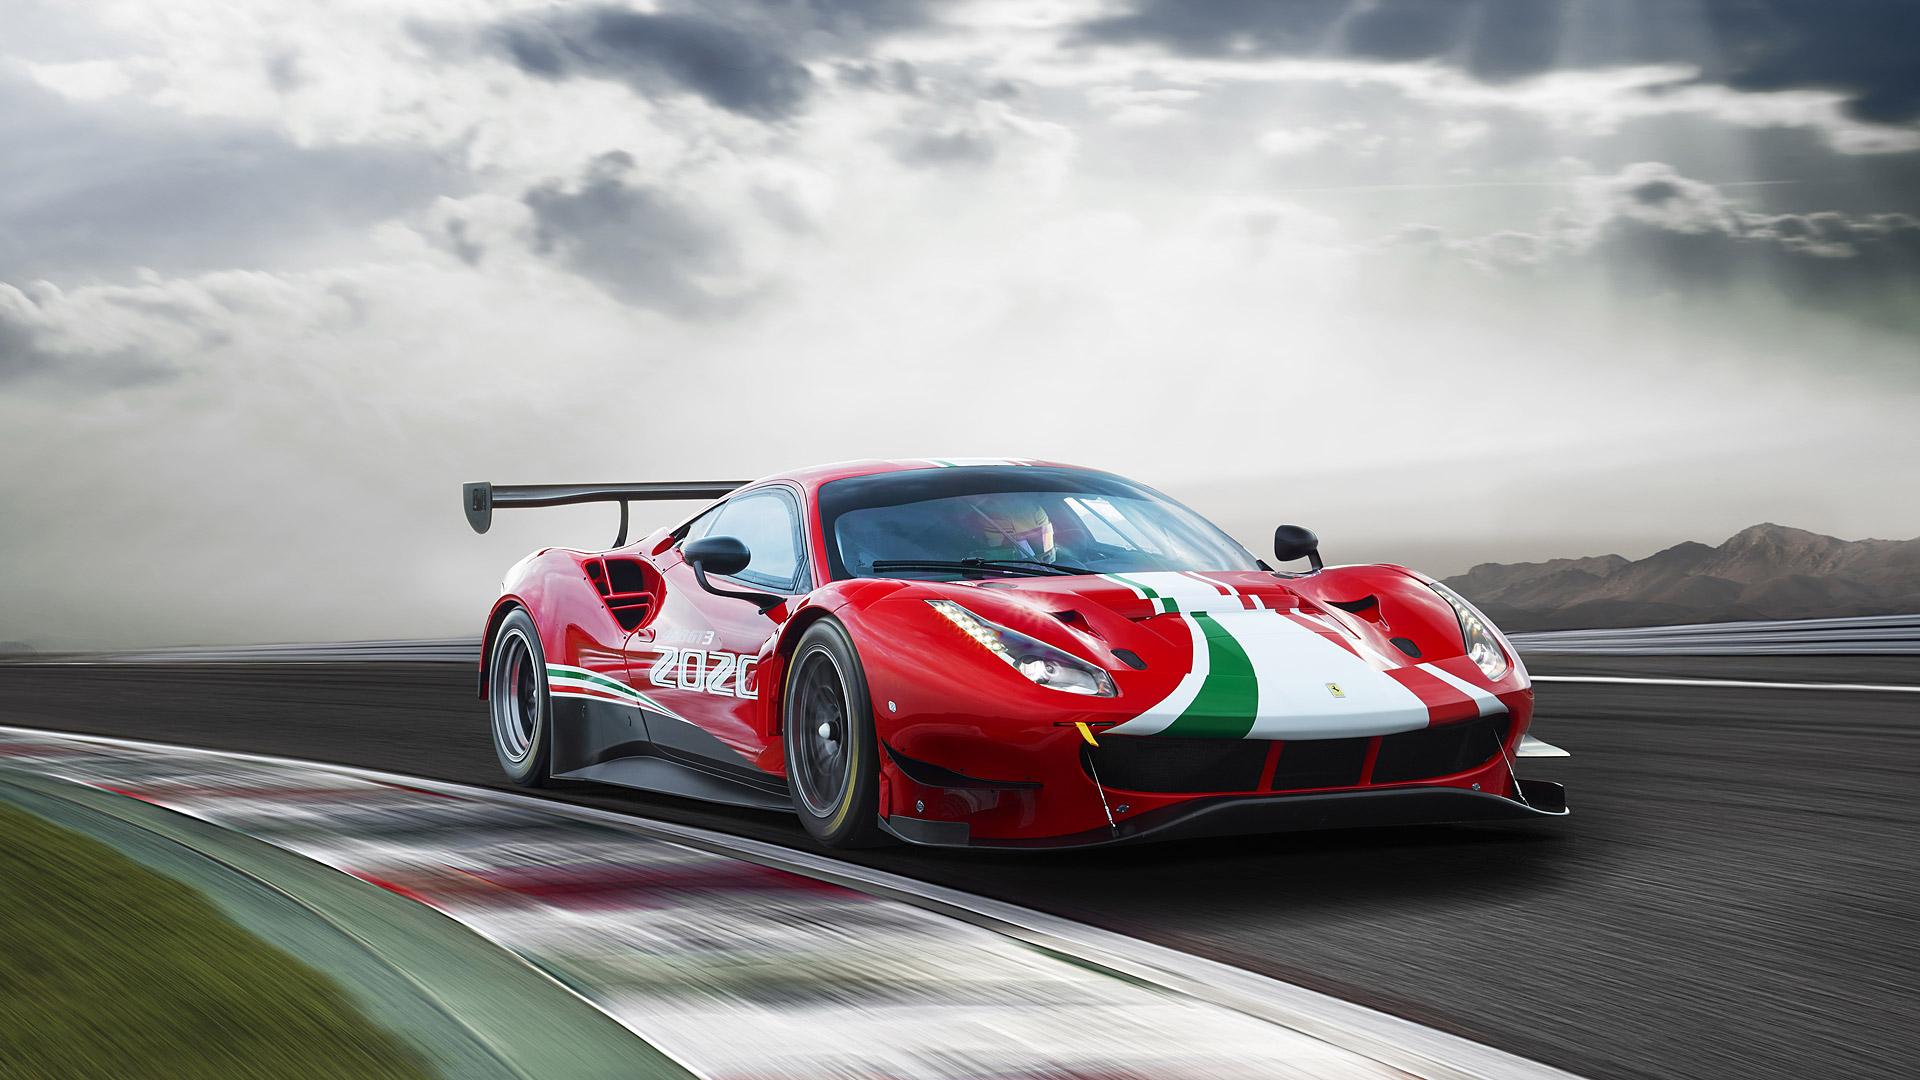 2020 Ferrari 488 GT3 Evo Wallpapers HD Images   WSupercars 1920x1080